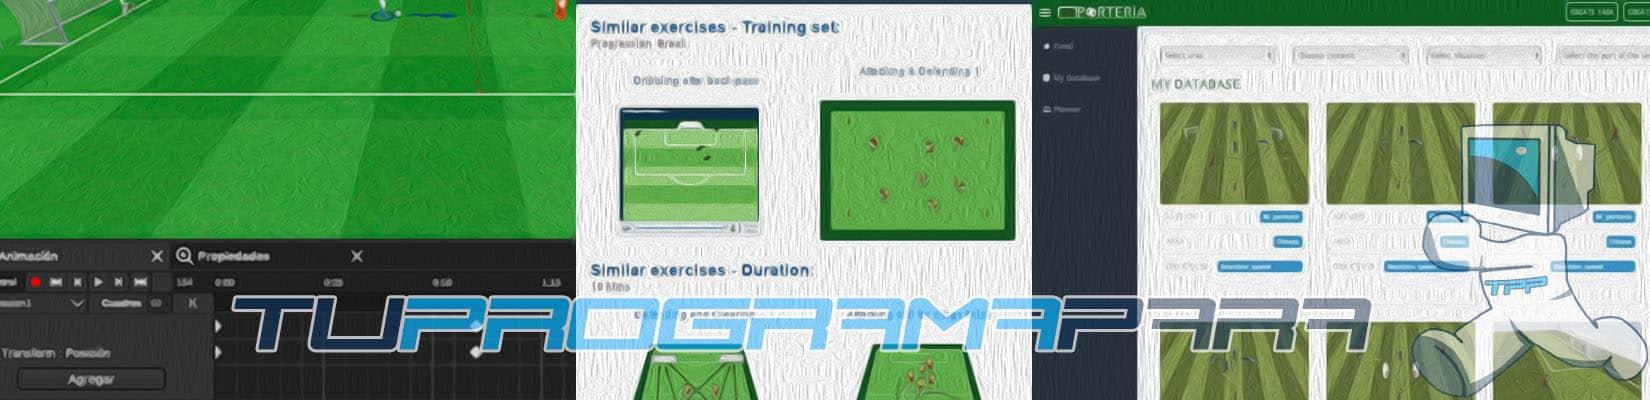 crear alineacion futbol